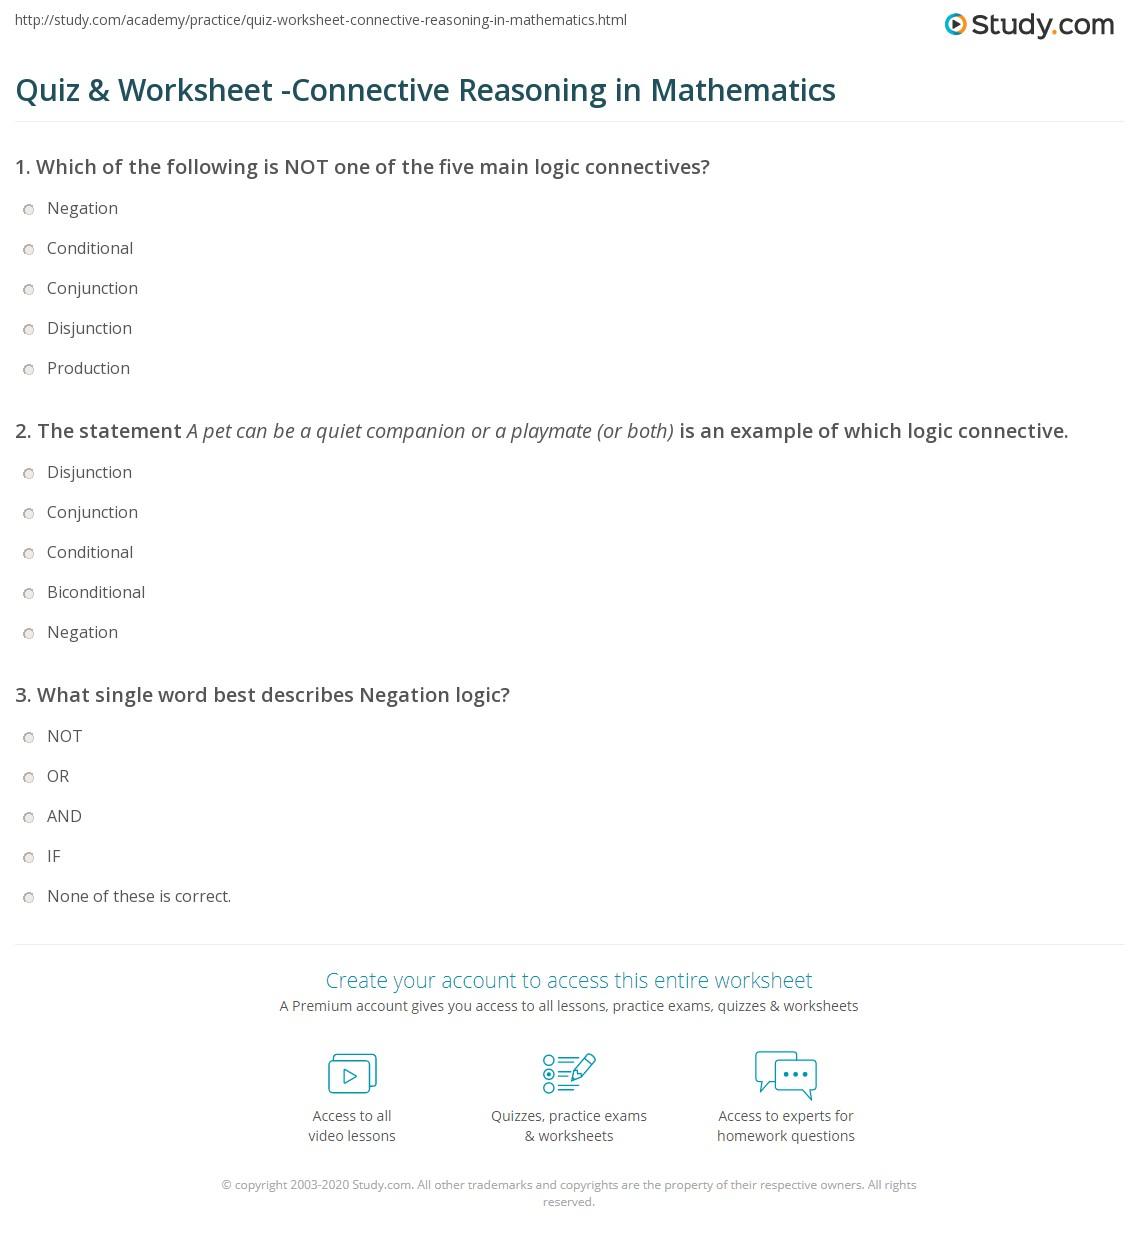 Quiz & Worksheet -Connective Reasoning in Mathematics | Study.com